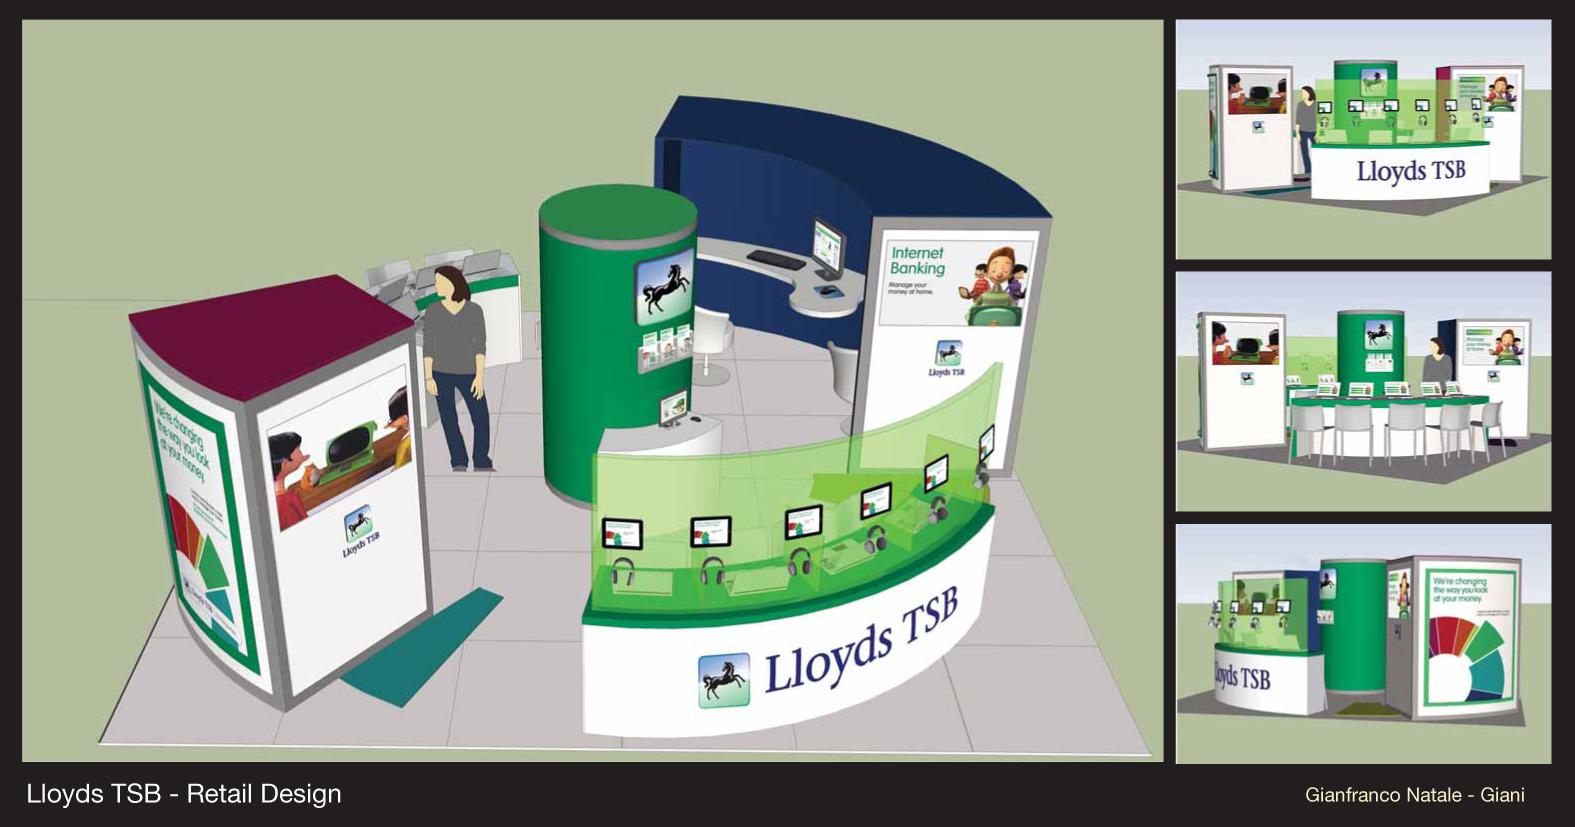 Brand Experience - Lloyds TSB - British National Retail